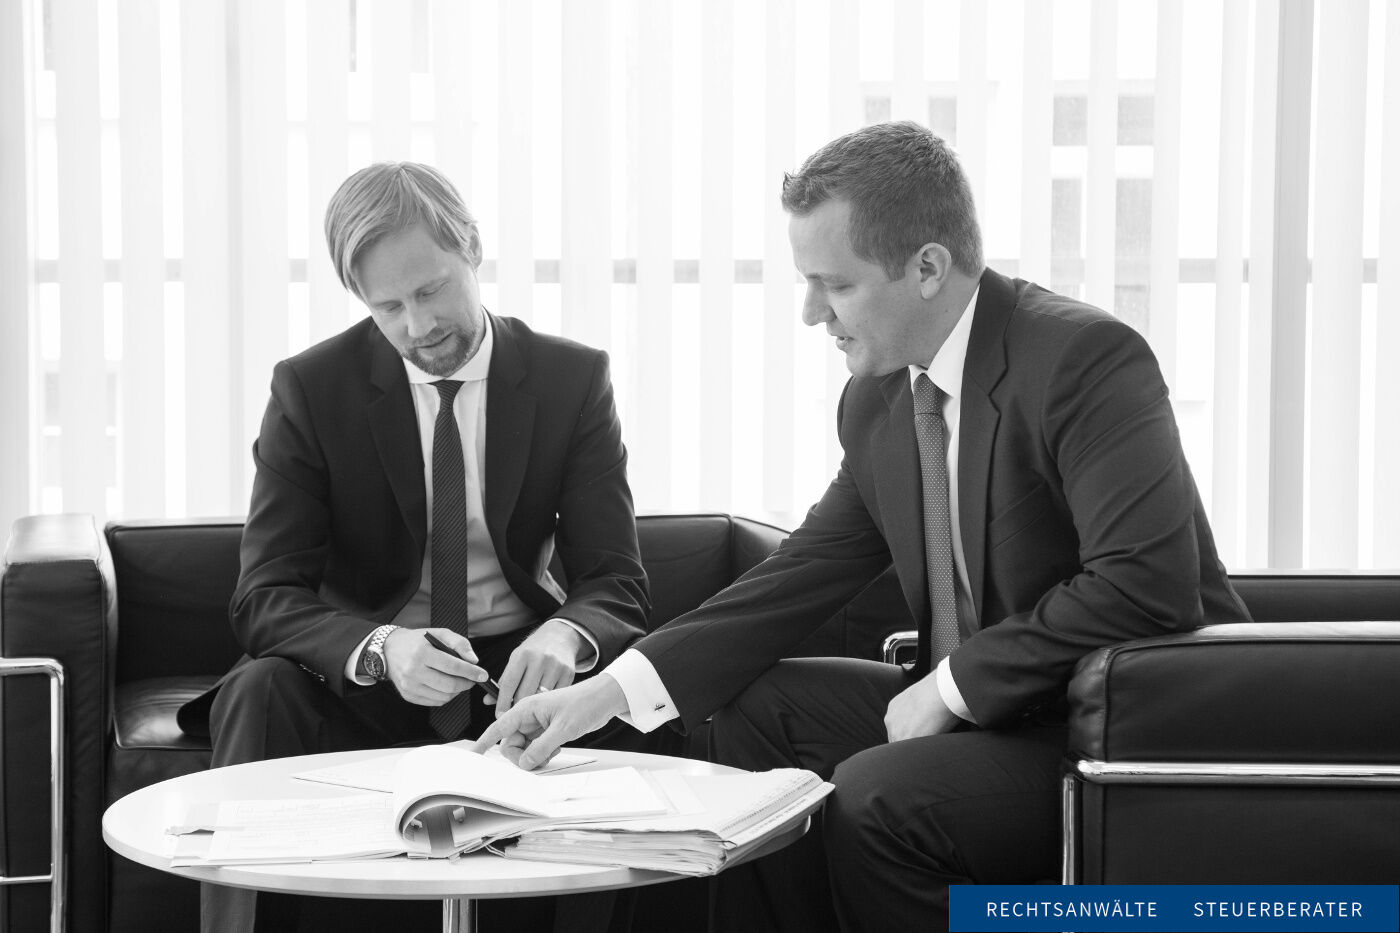 Rechtsanwalt (m/w/d) ziviles Wirtschaftsrecht in Teilzeit - Job - SNP Karriere - Bewerbungsformular